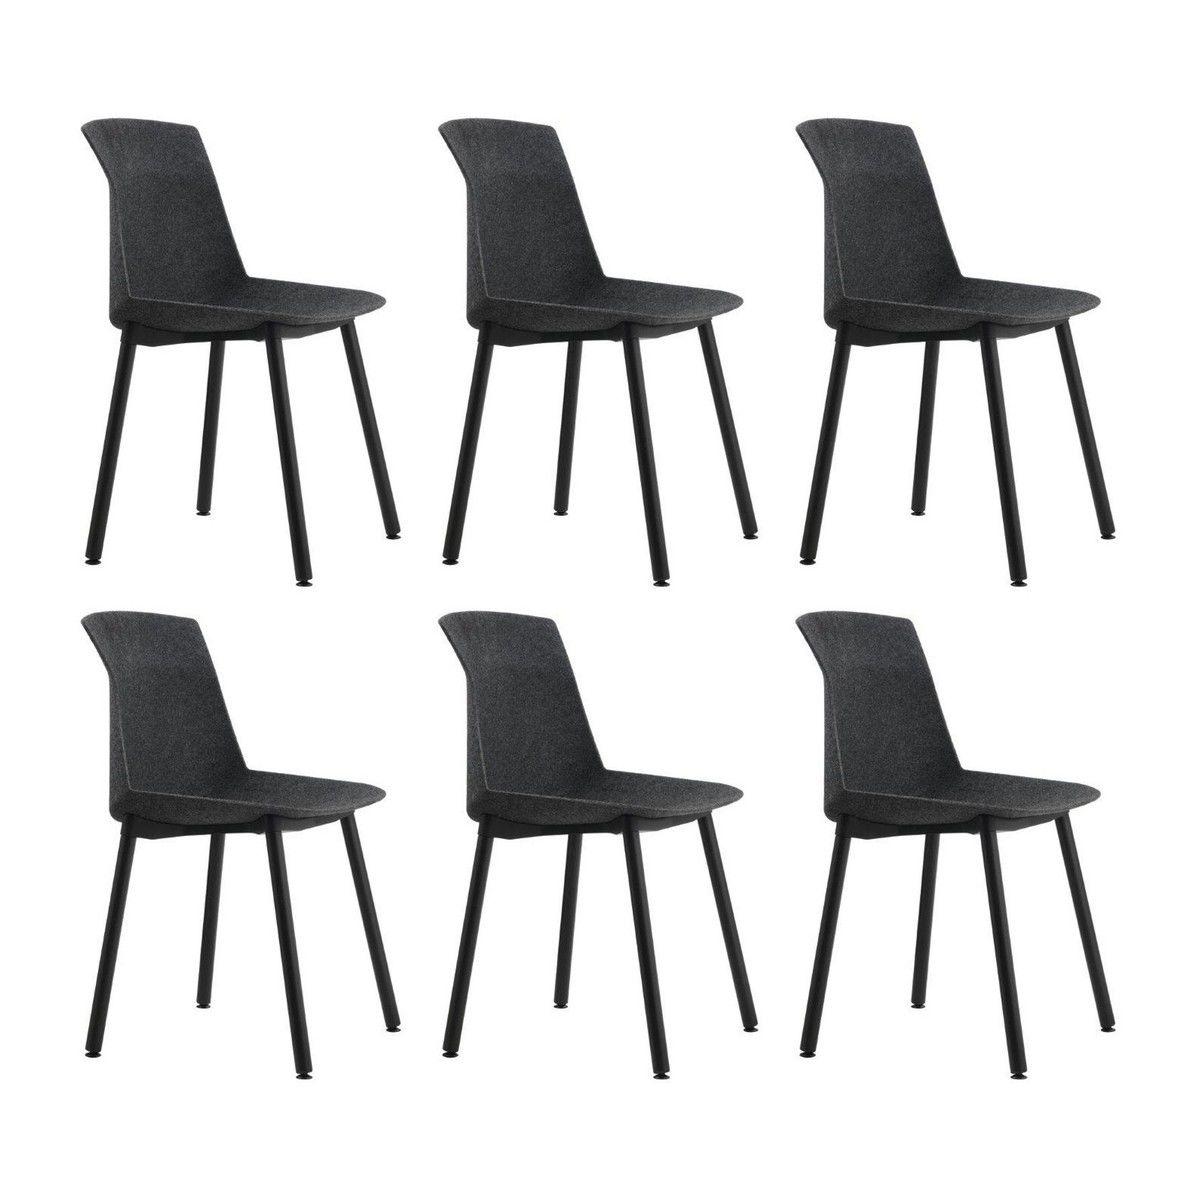 motek lot de 6 chaises en promotion cassina. Black Bedroom Furniture Sets. Home Design Ideas